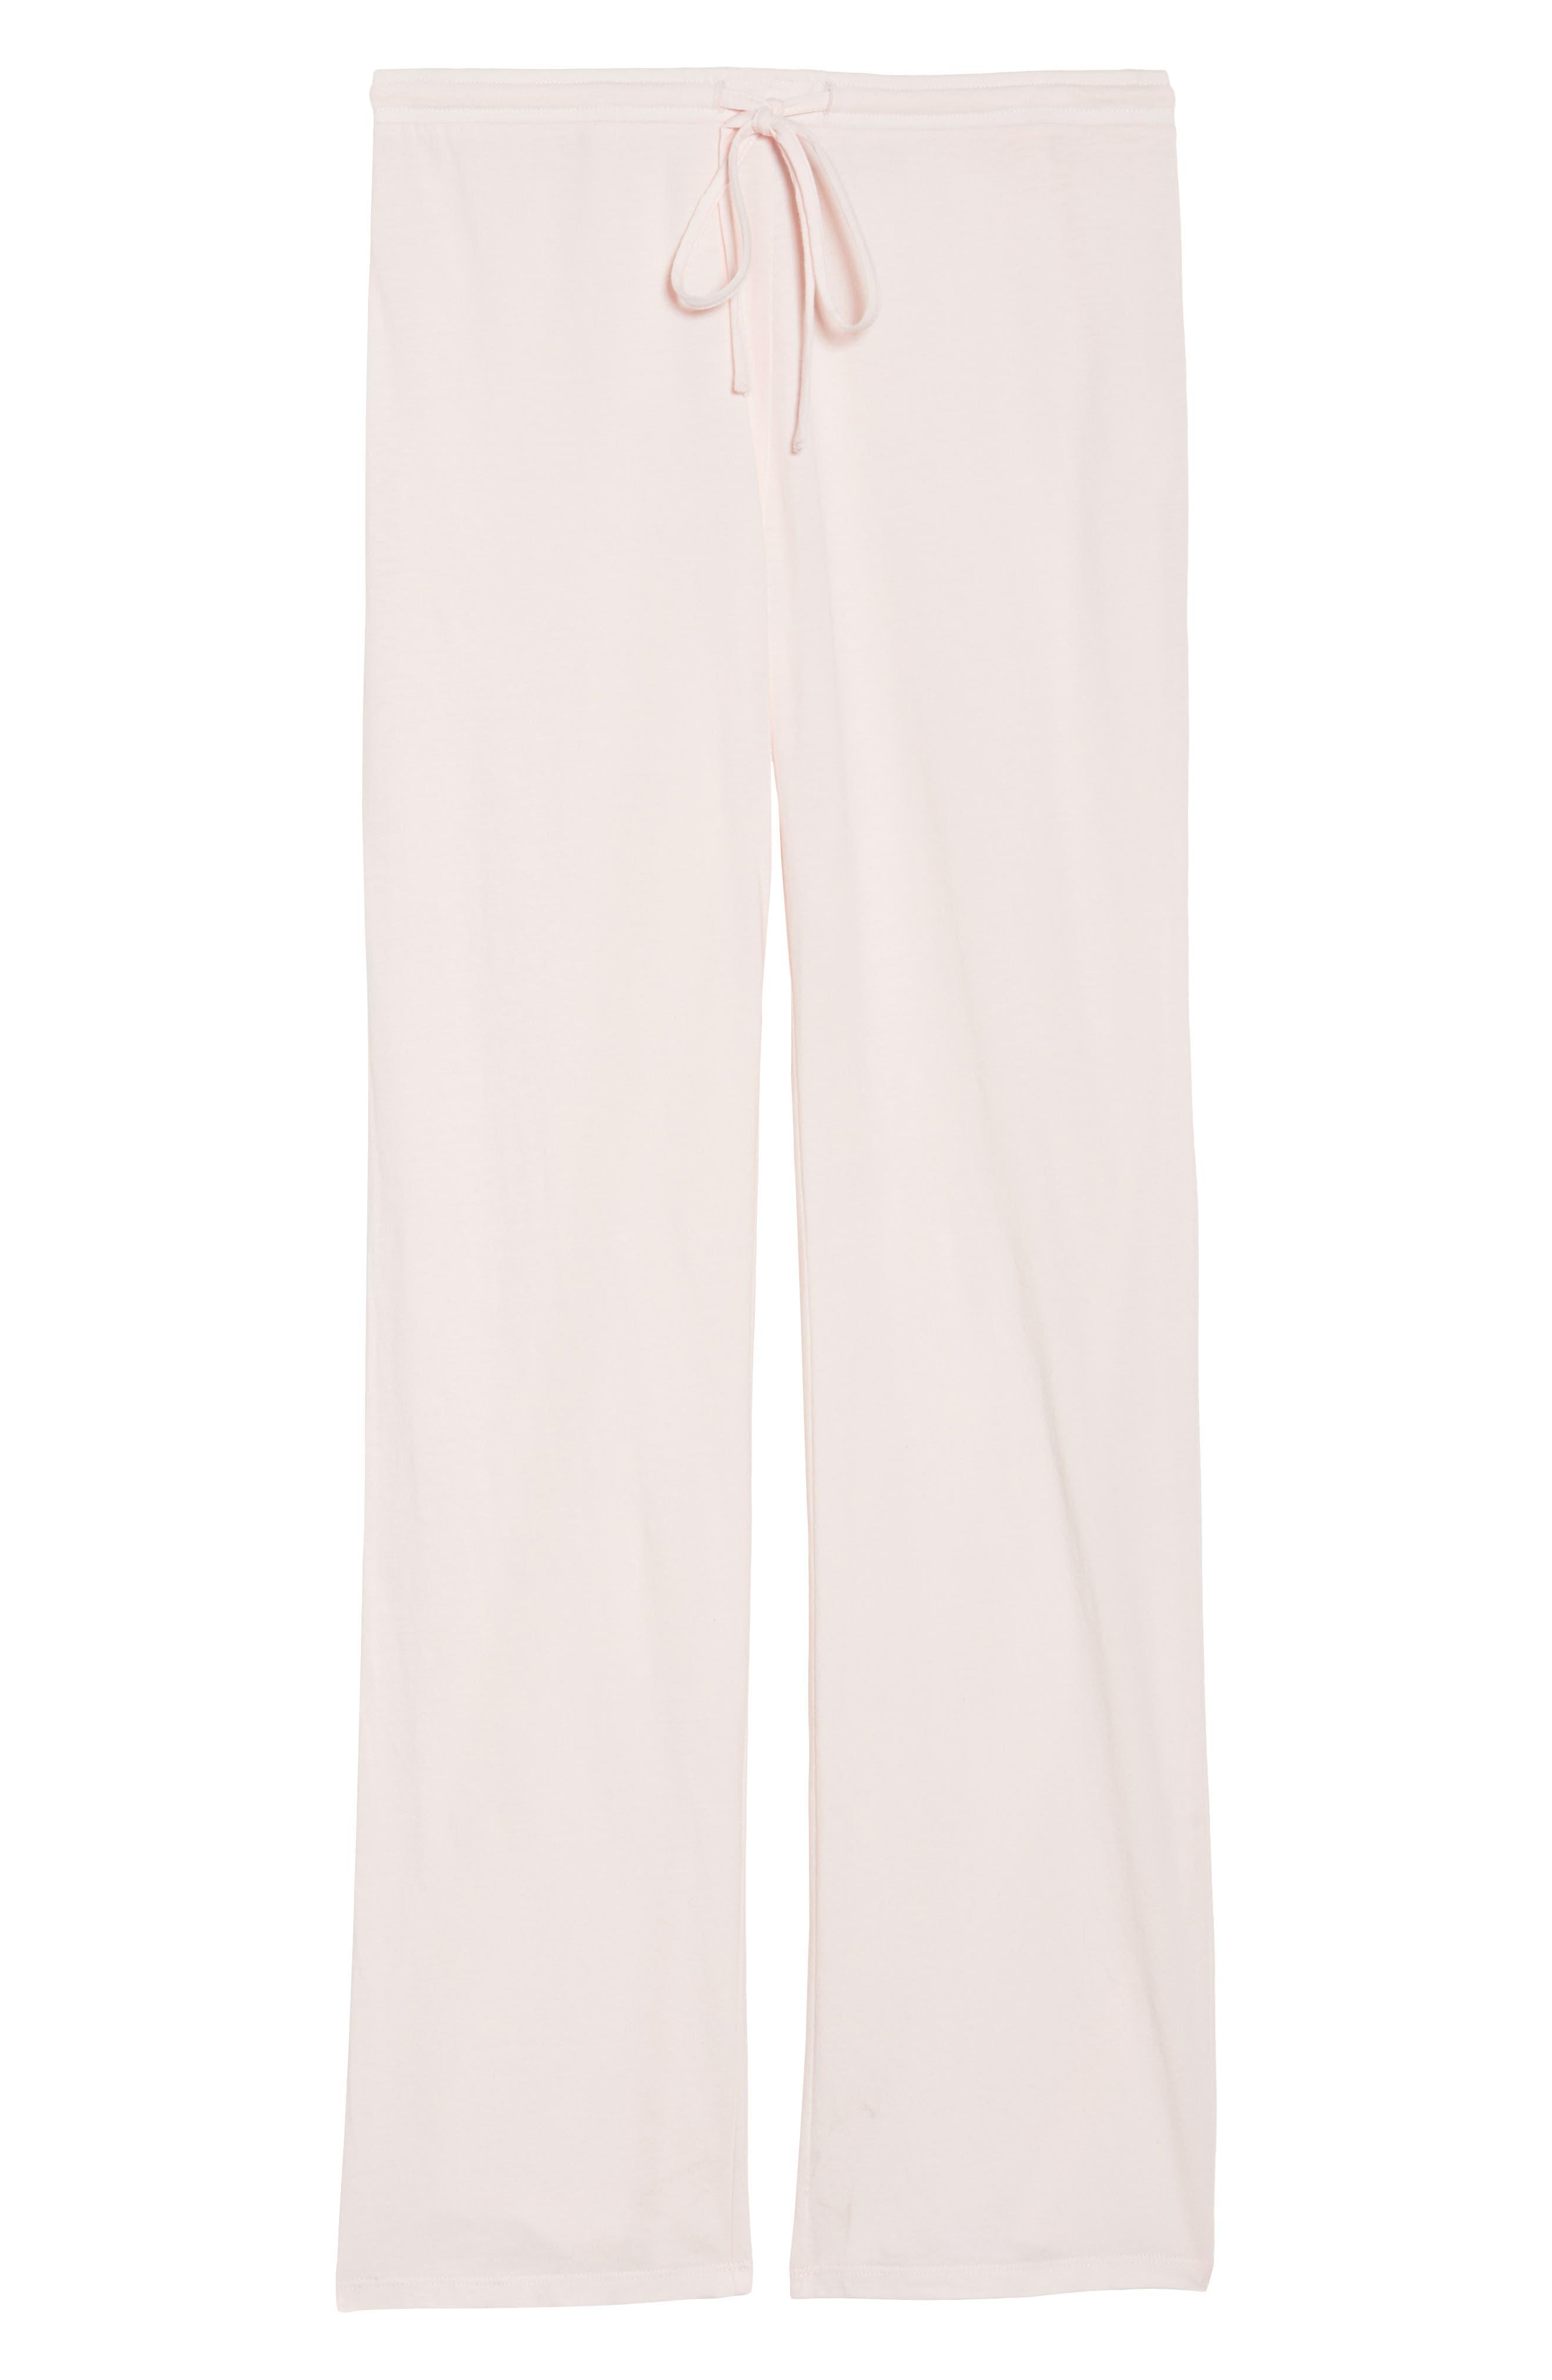 Breathe Lounge Pants,                             Alternate thumbnail 4, color,                             Pink Frosty